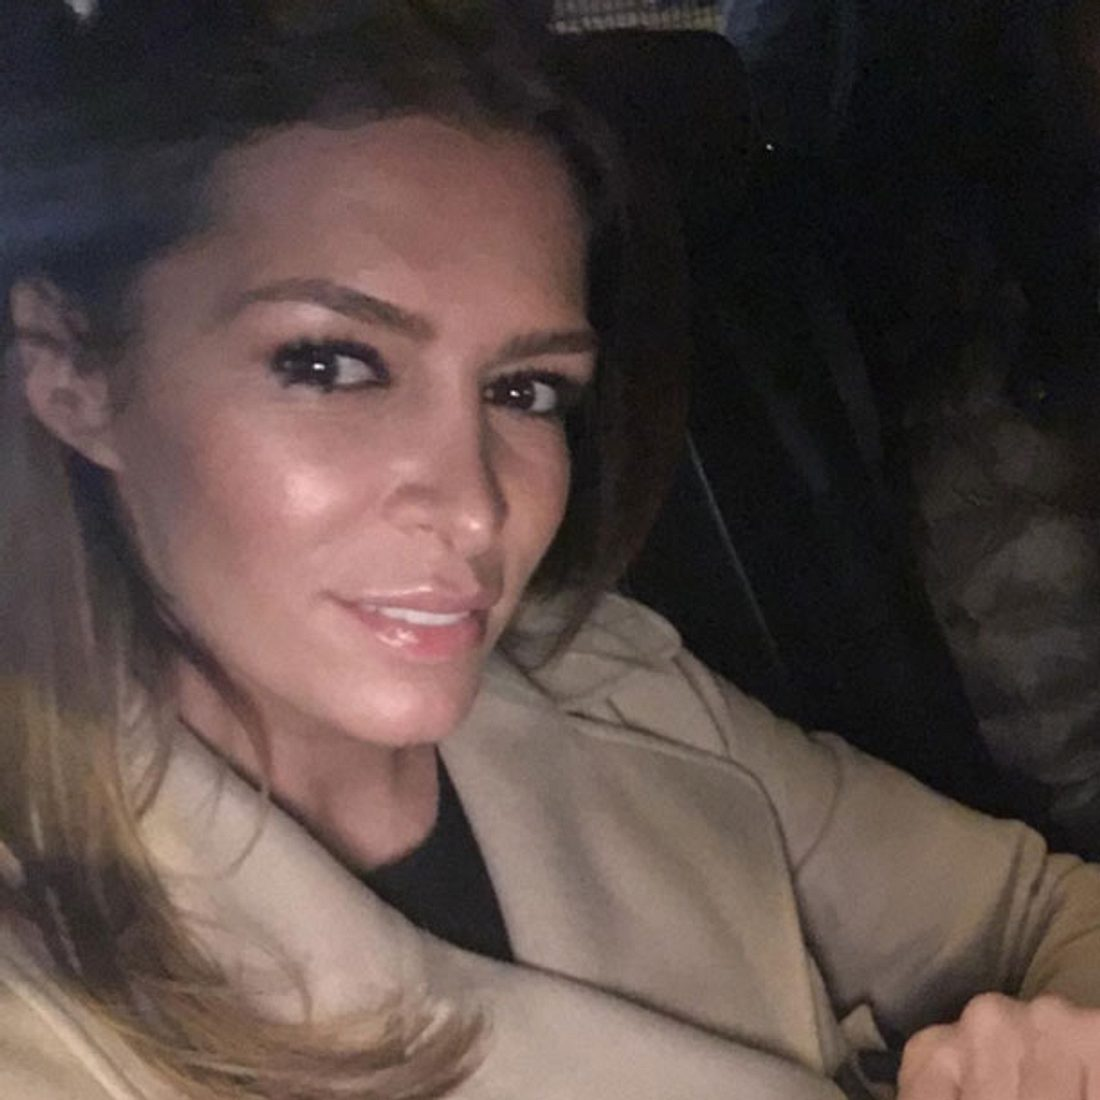 Sabia Boulahrouz sieht aus wie Eva Longoria